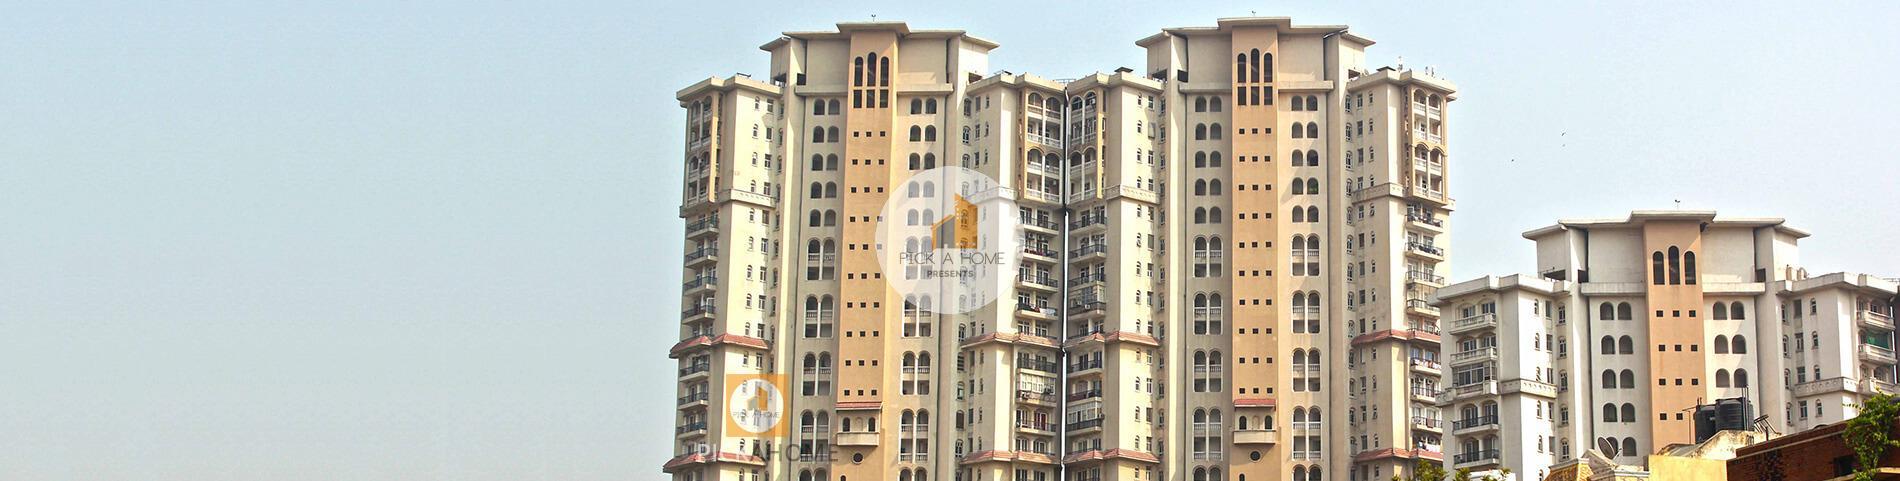 Dlf Regency Park 1 Gurgaon Buy Sell Rent